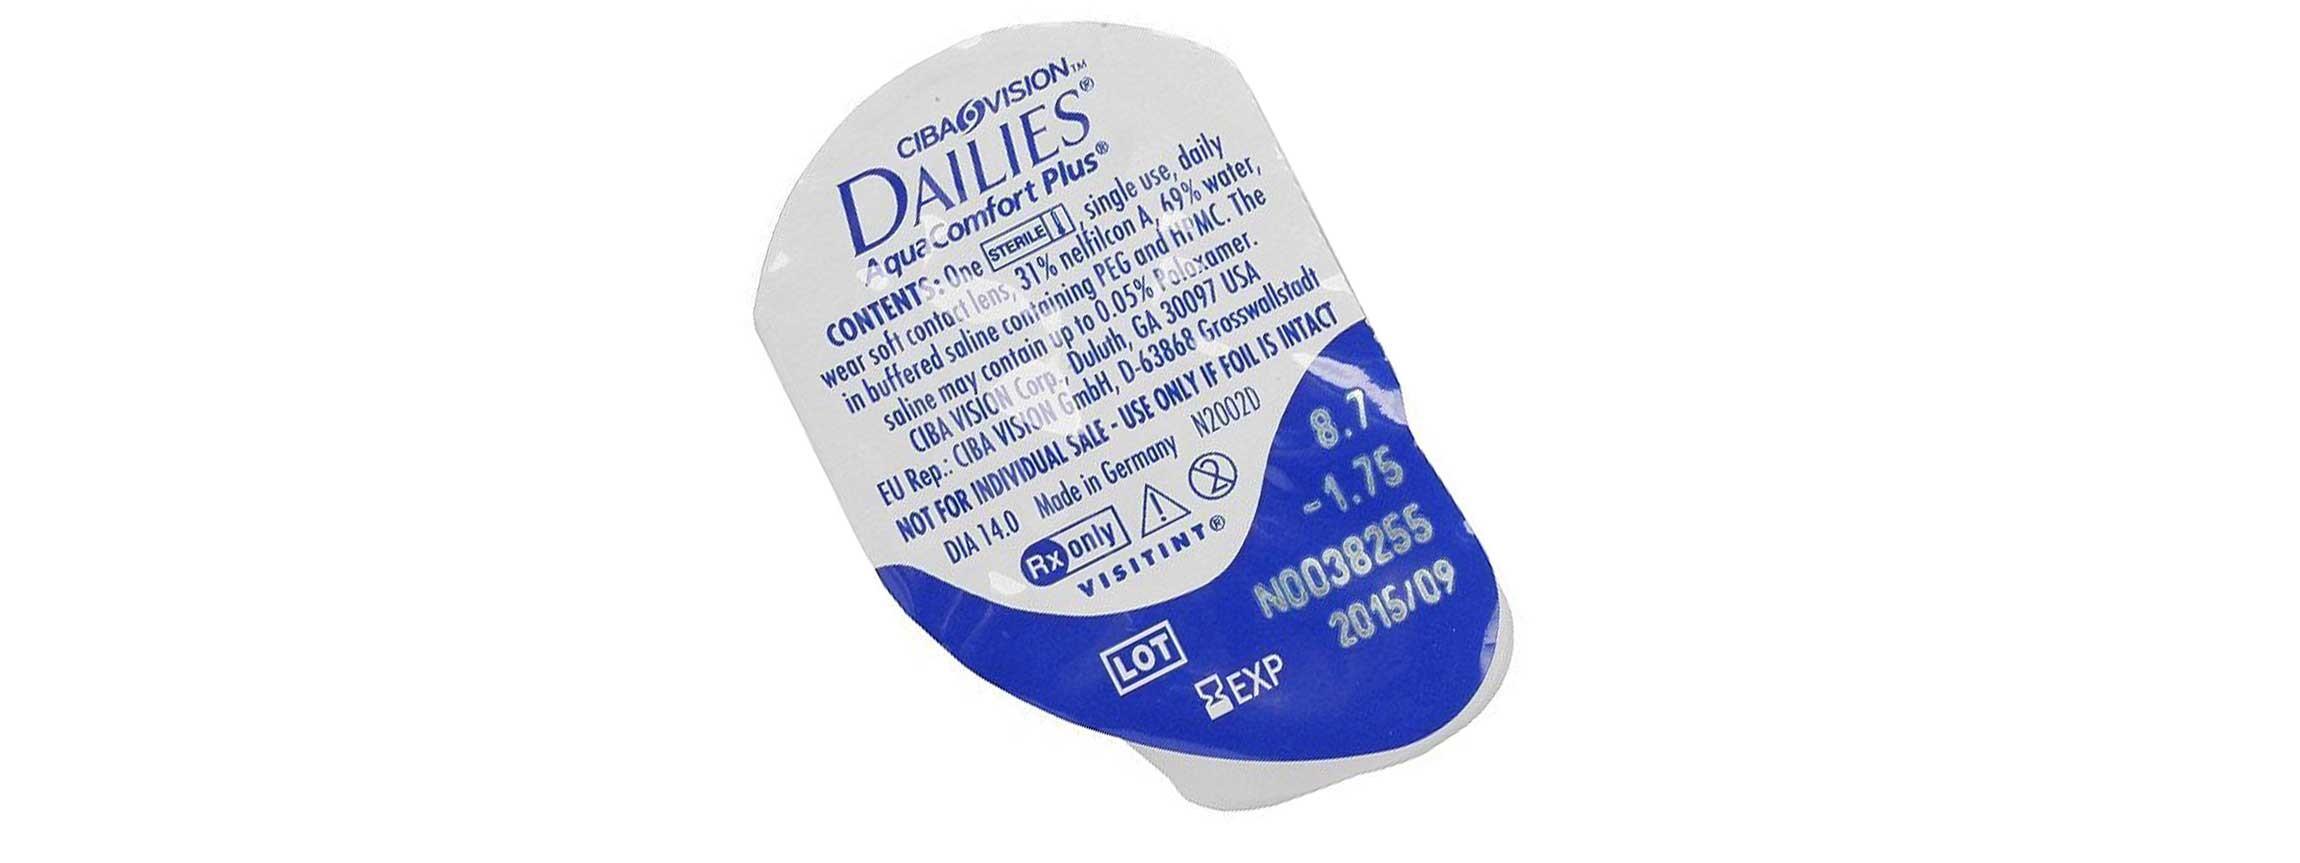 aqua soczewki jednodniowe promo dailies comforter plus comfort oryginalne szt